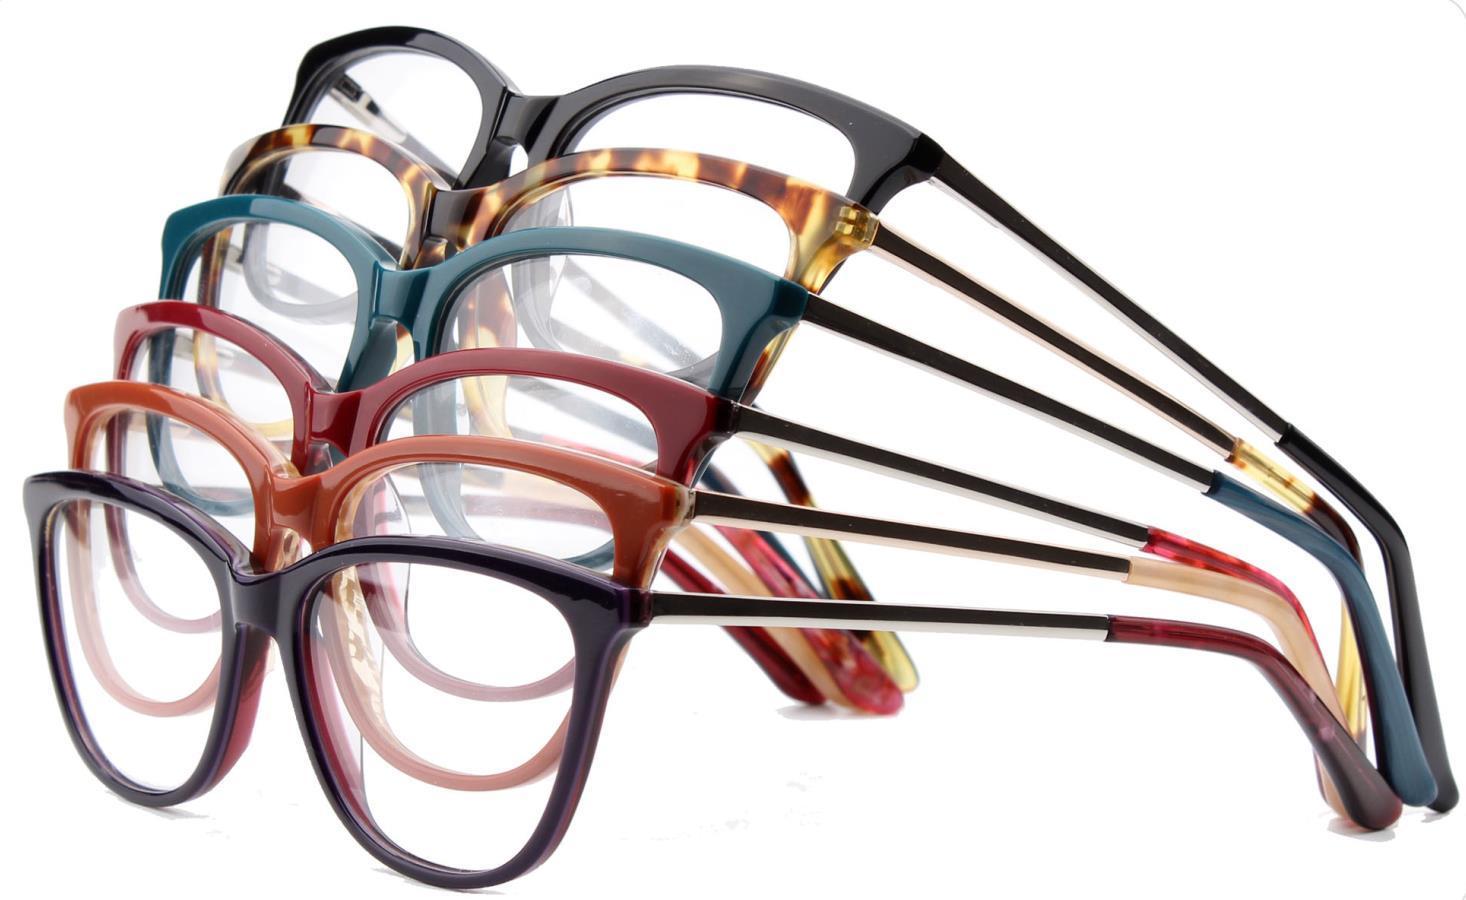 11ad414f8a Online Trend 2018 New Model Ready Stock Acetate Metal Optical Women Eye  Glasses Eyeglasses Frames